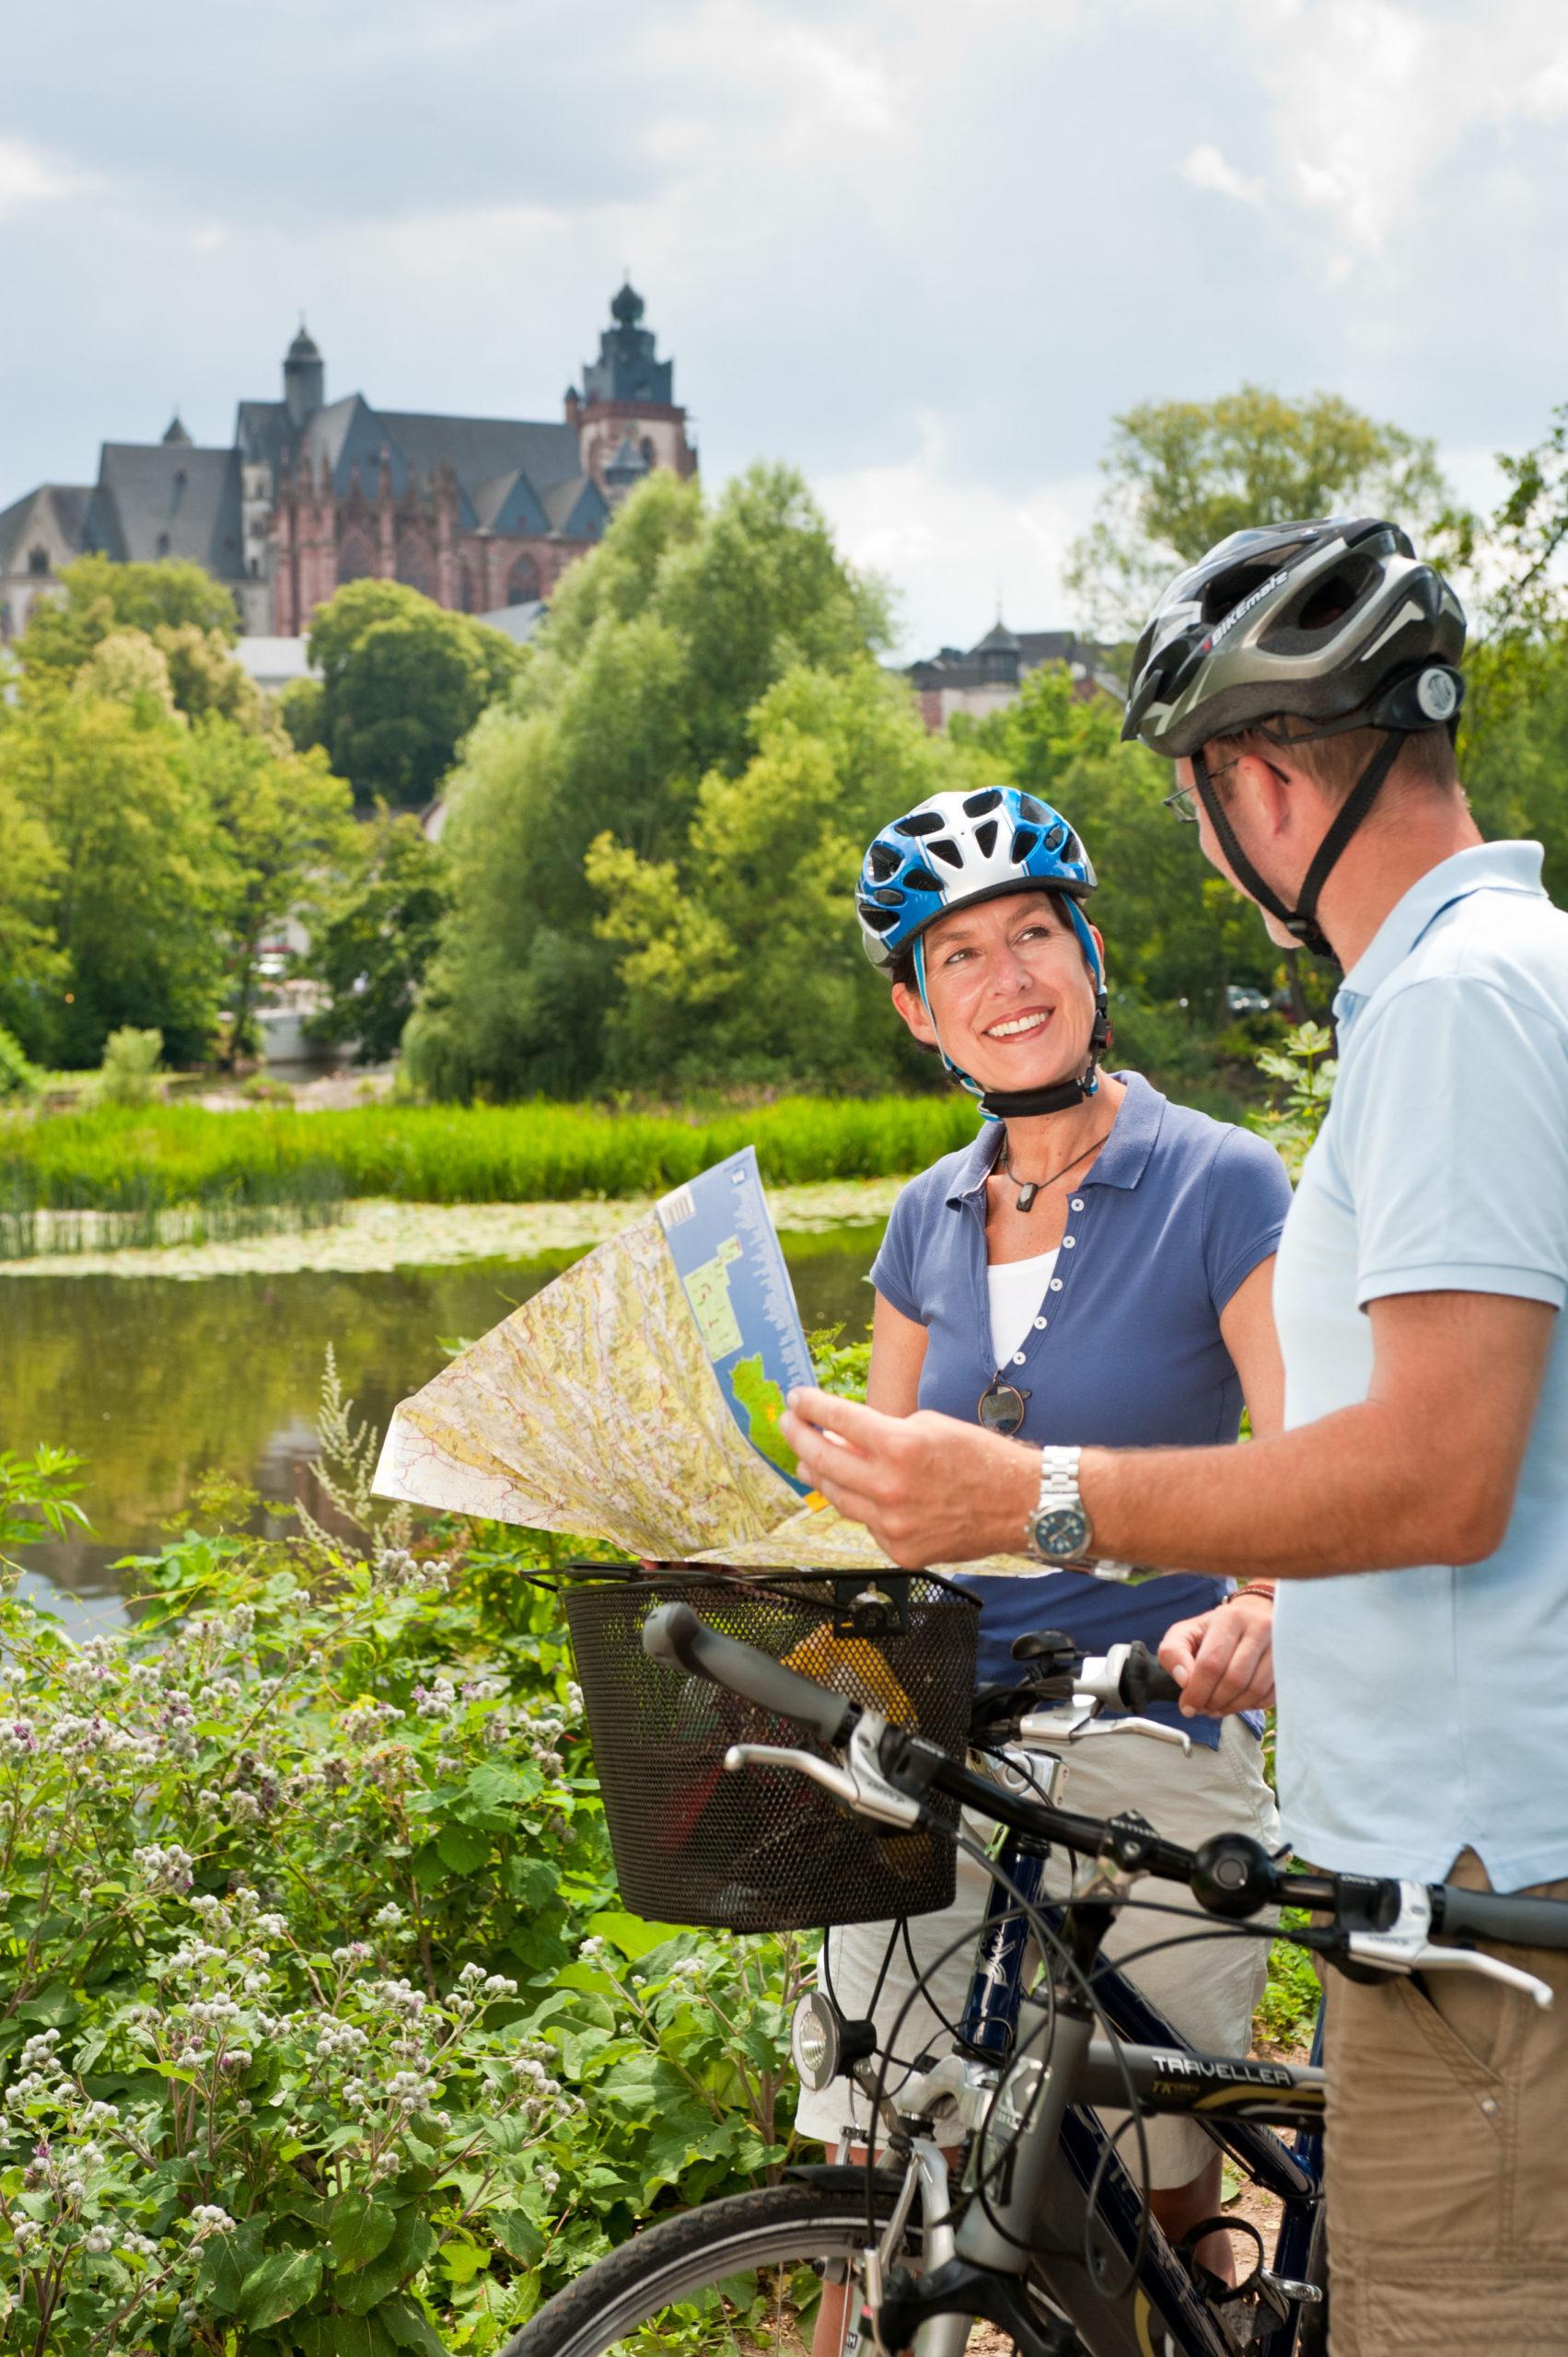 Radtour im Lahntal bei Wetzlar